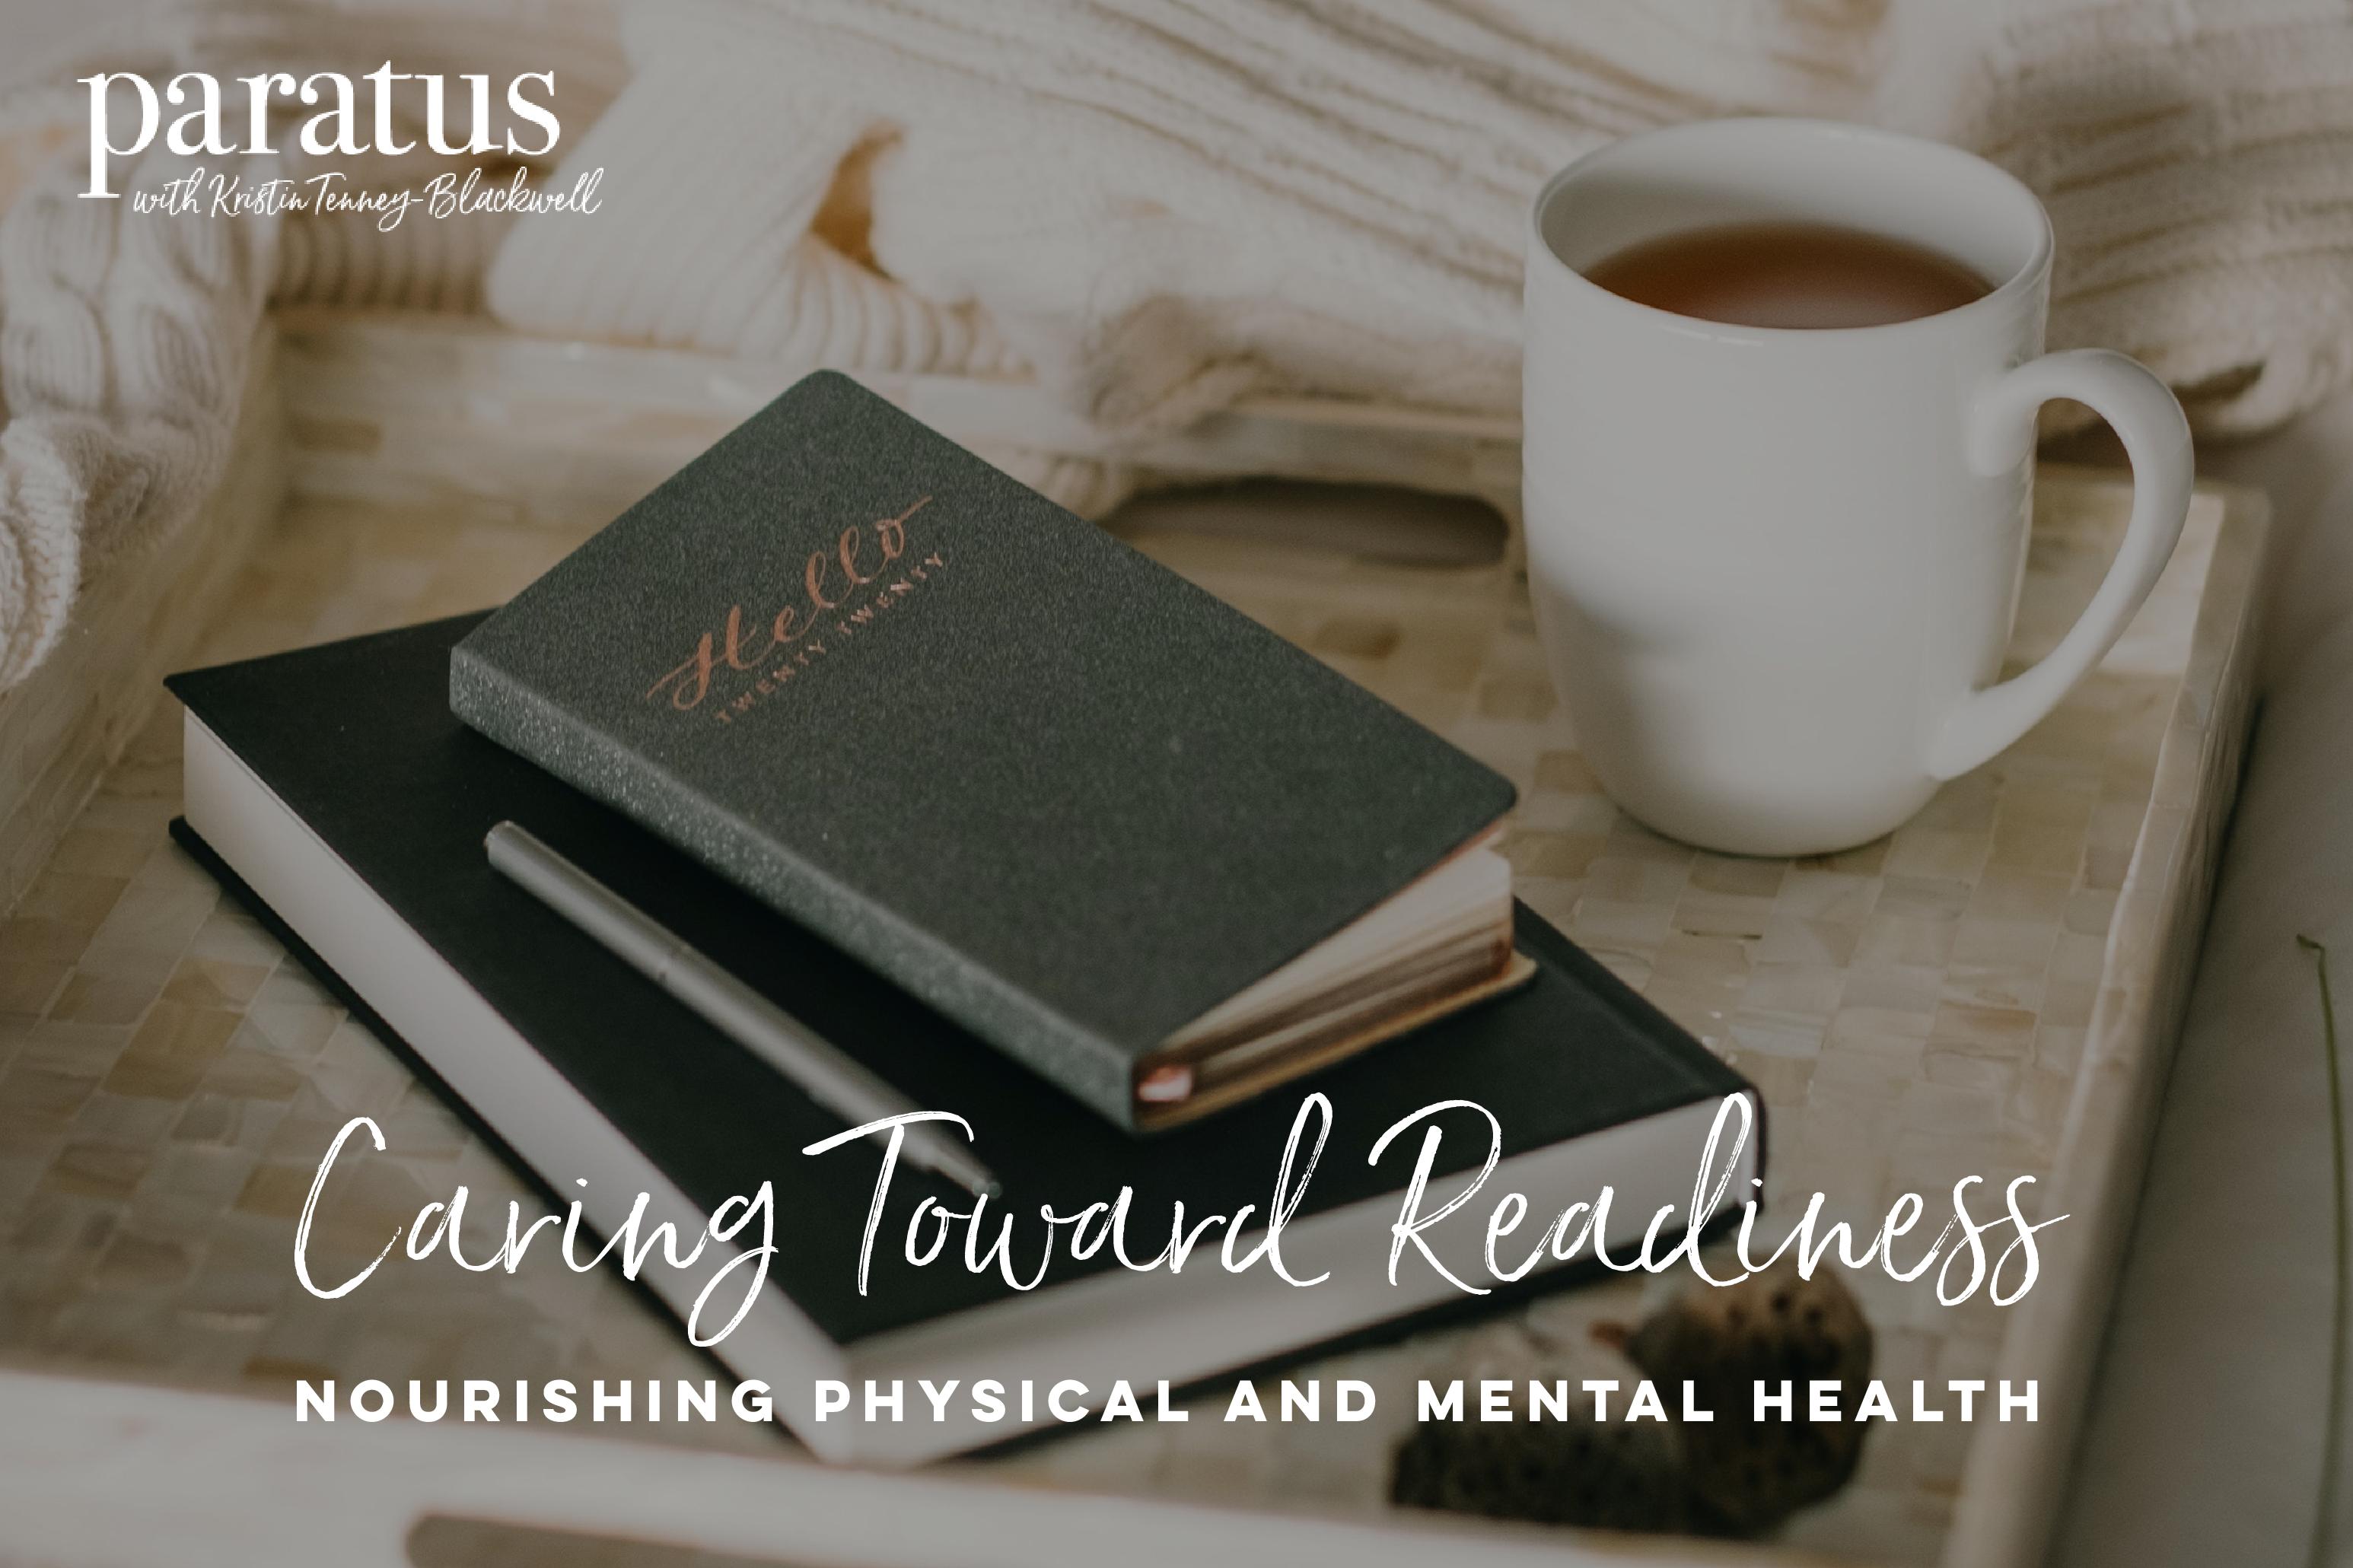 Kristin Tenney-Blackwell blog Caring Toward Readiness